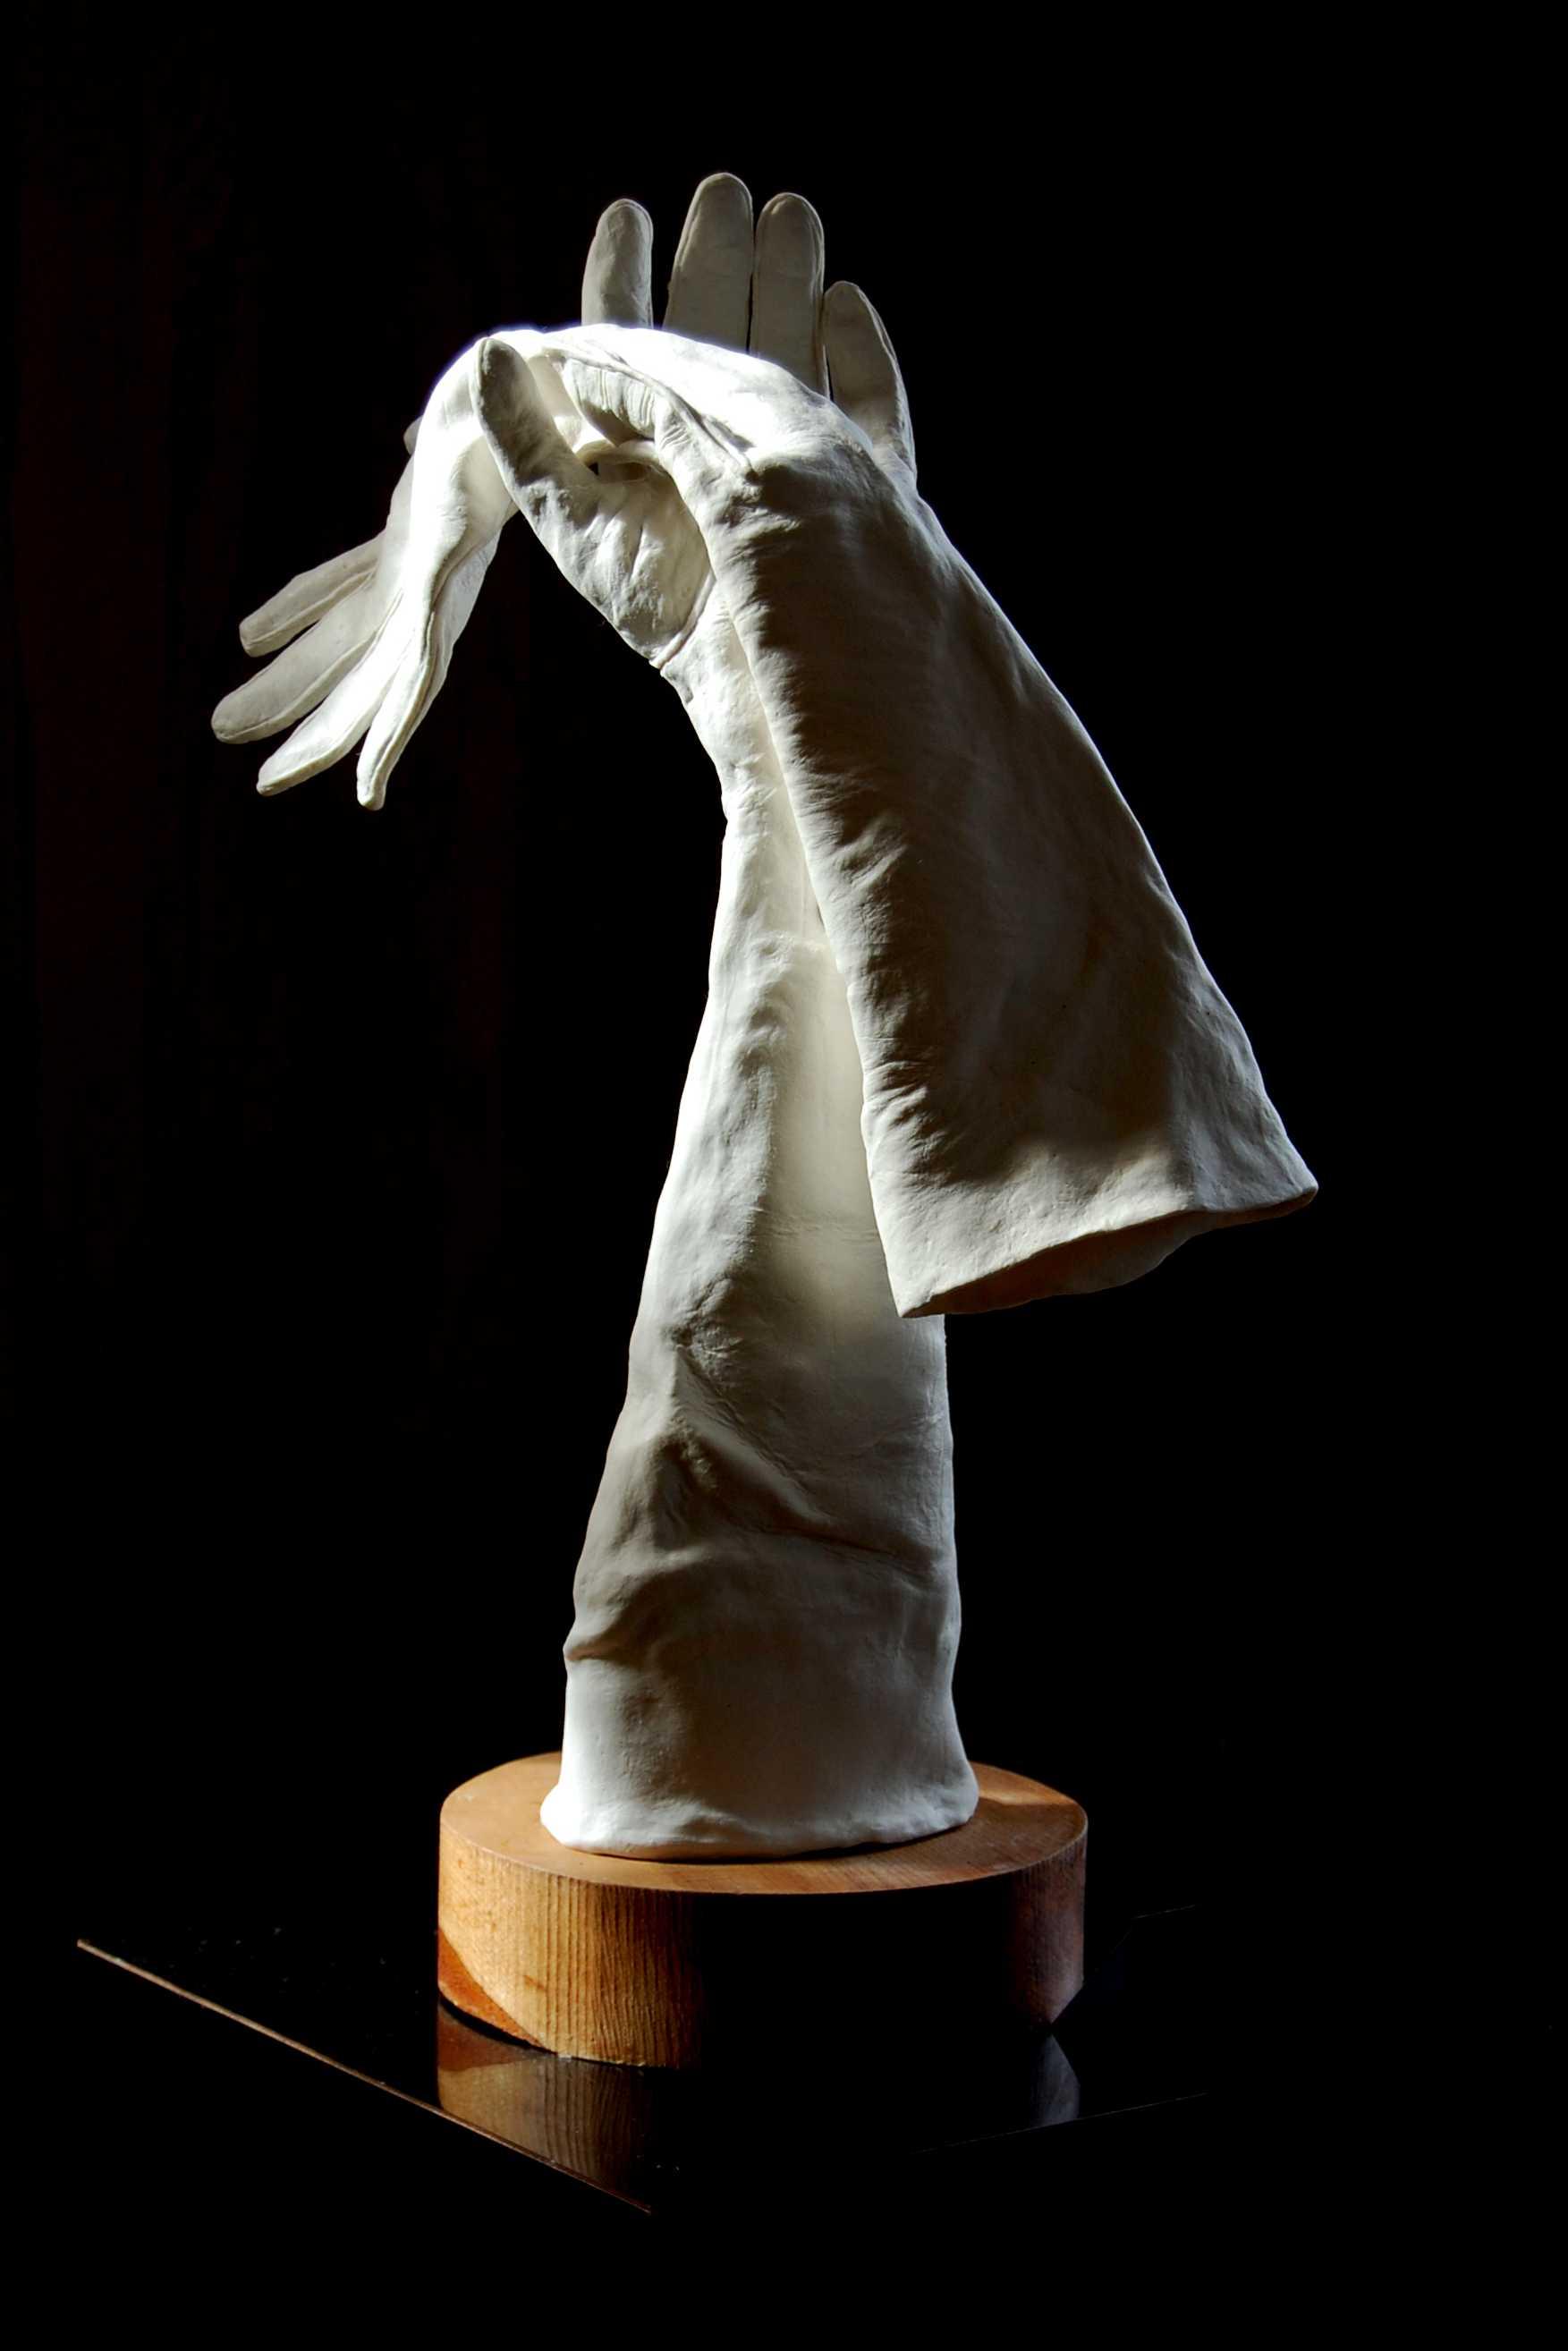 Hand in Glove, porcelain